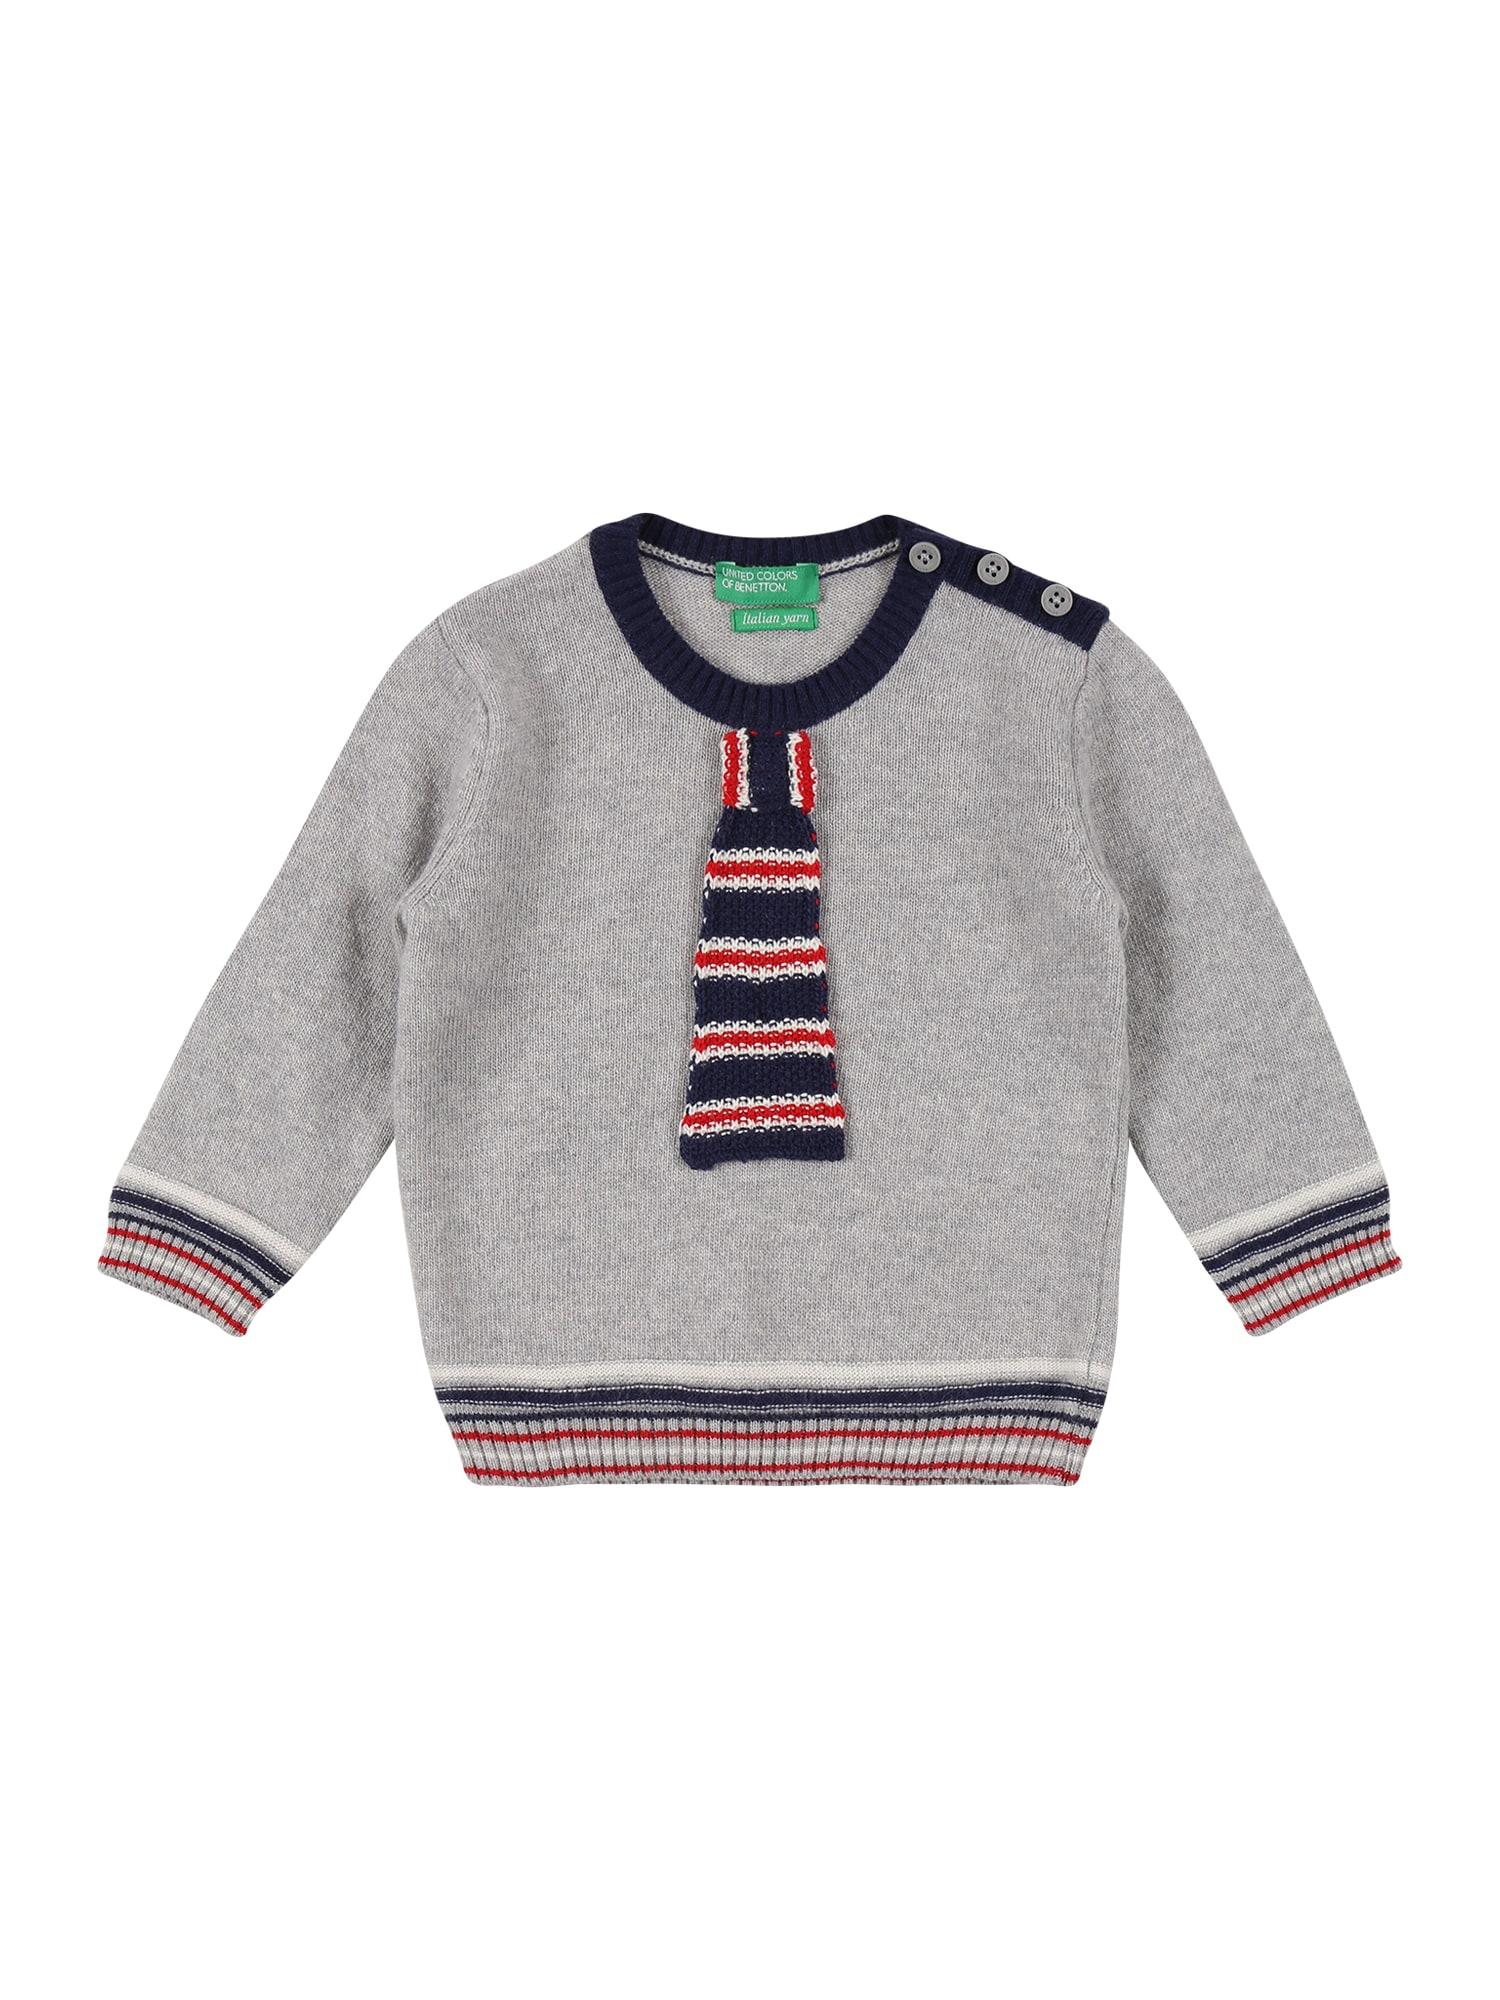 UNITED COLORS OF BENETTON Megztinis mišrios spalvos / margai pilka